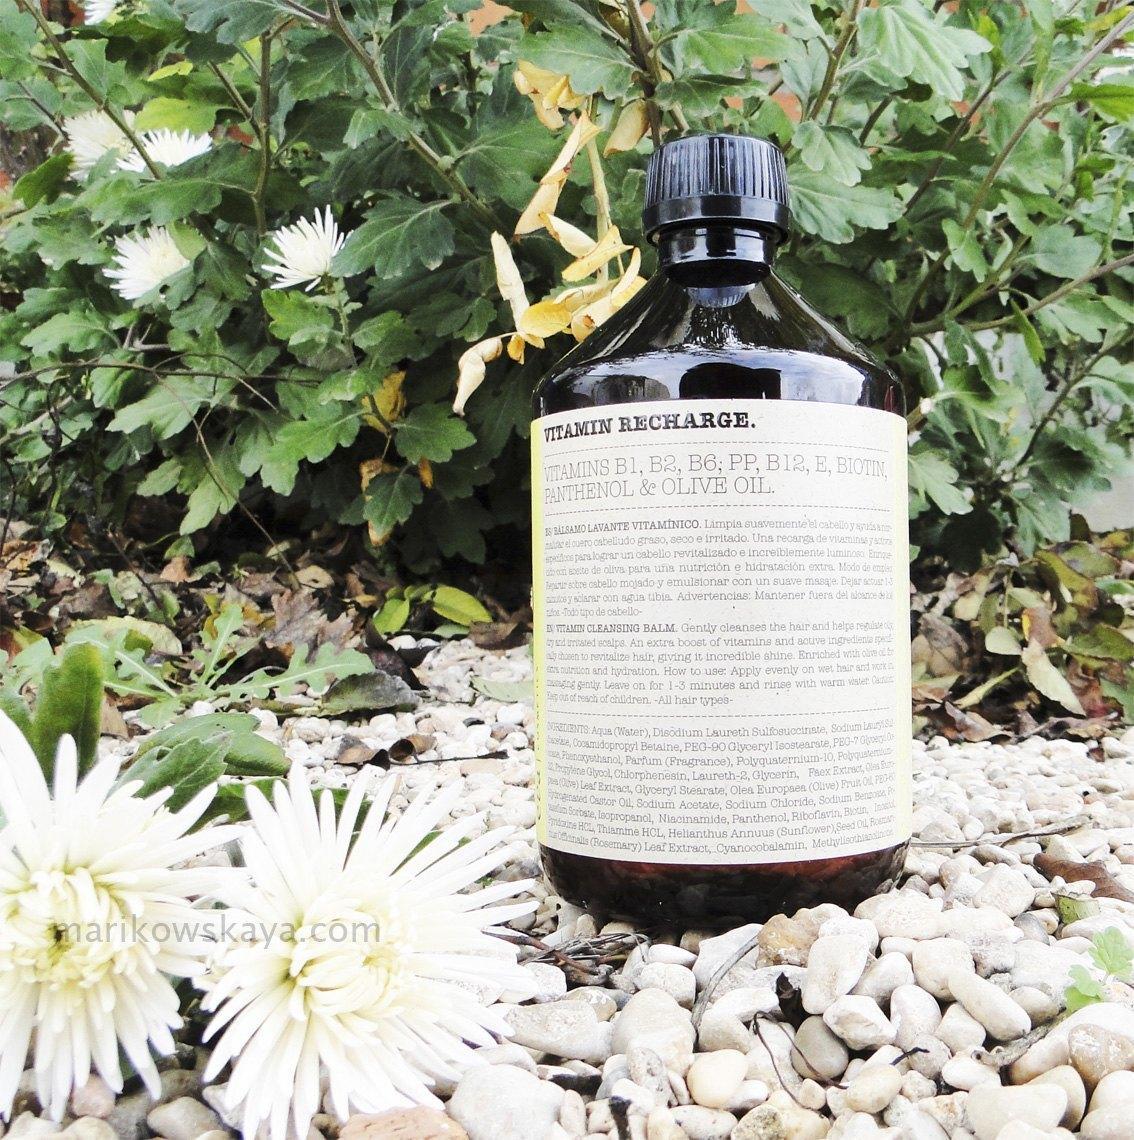 champusinsulfatos-evacosmetics-vitaminrecharge